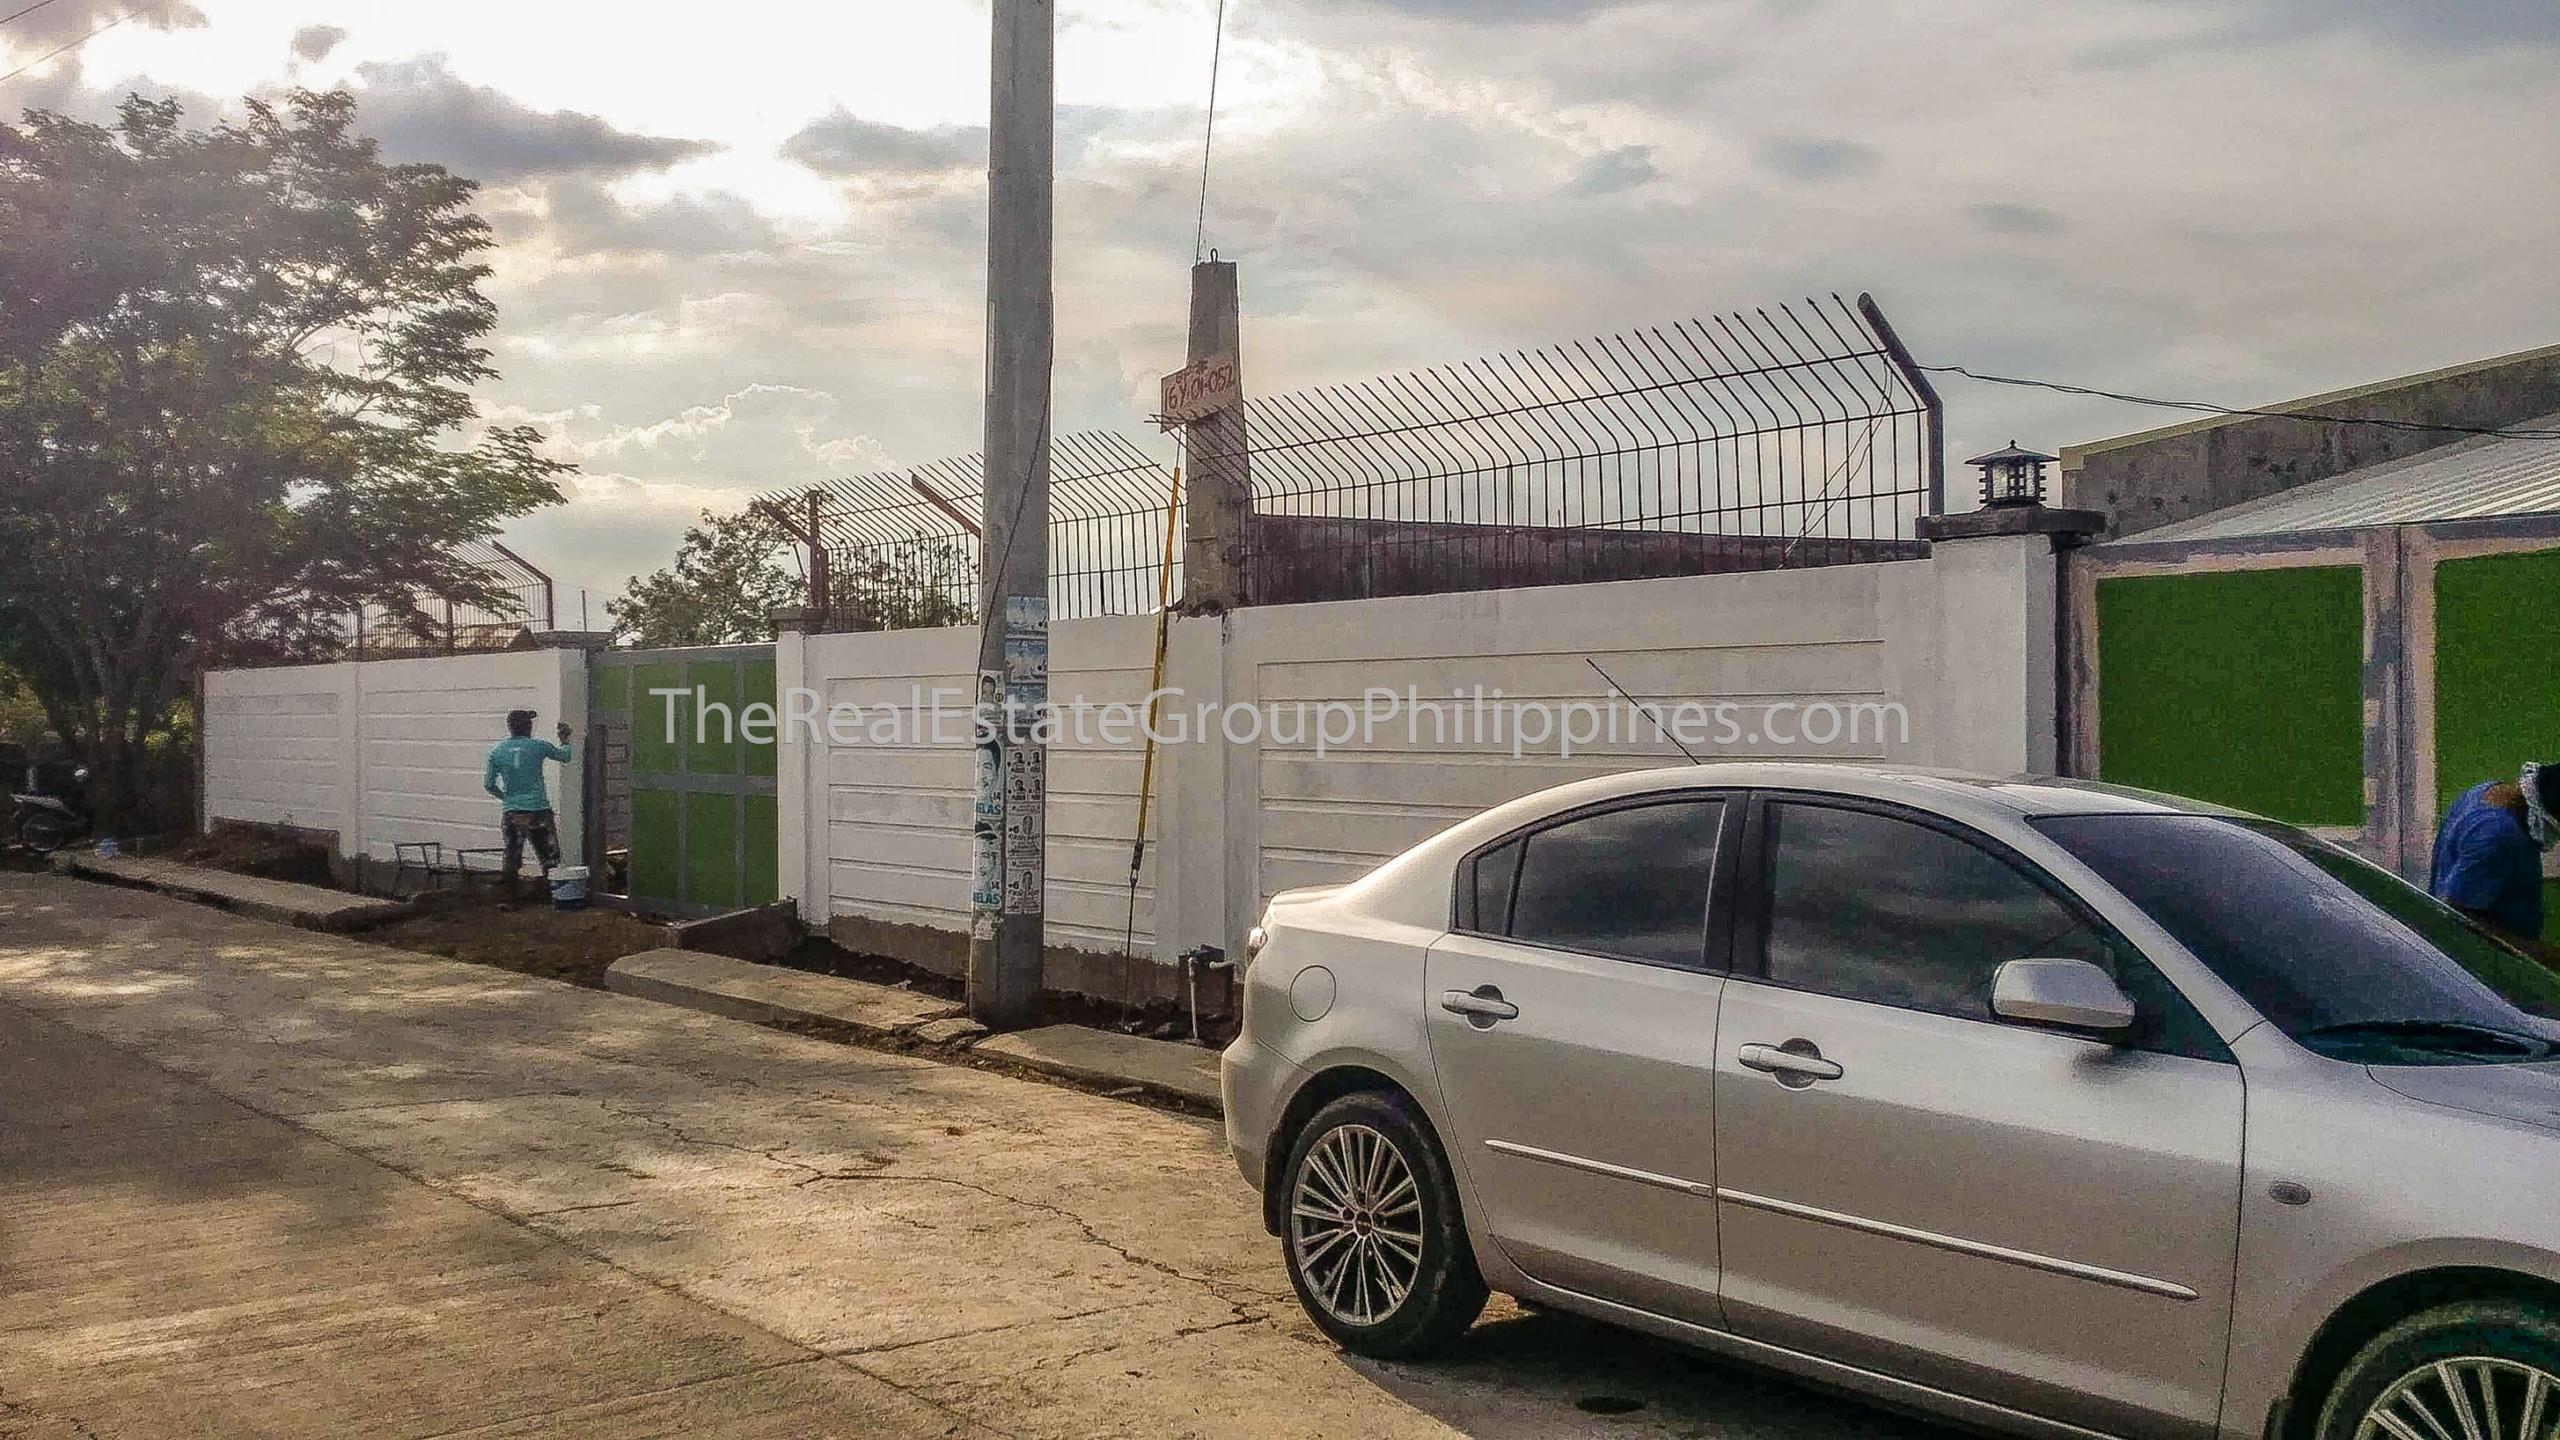 4371 Sqm House For Sale, Brgy Mahabang Parang, Binangonan Rizal-3